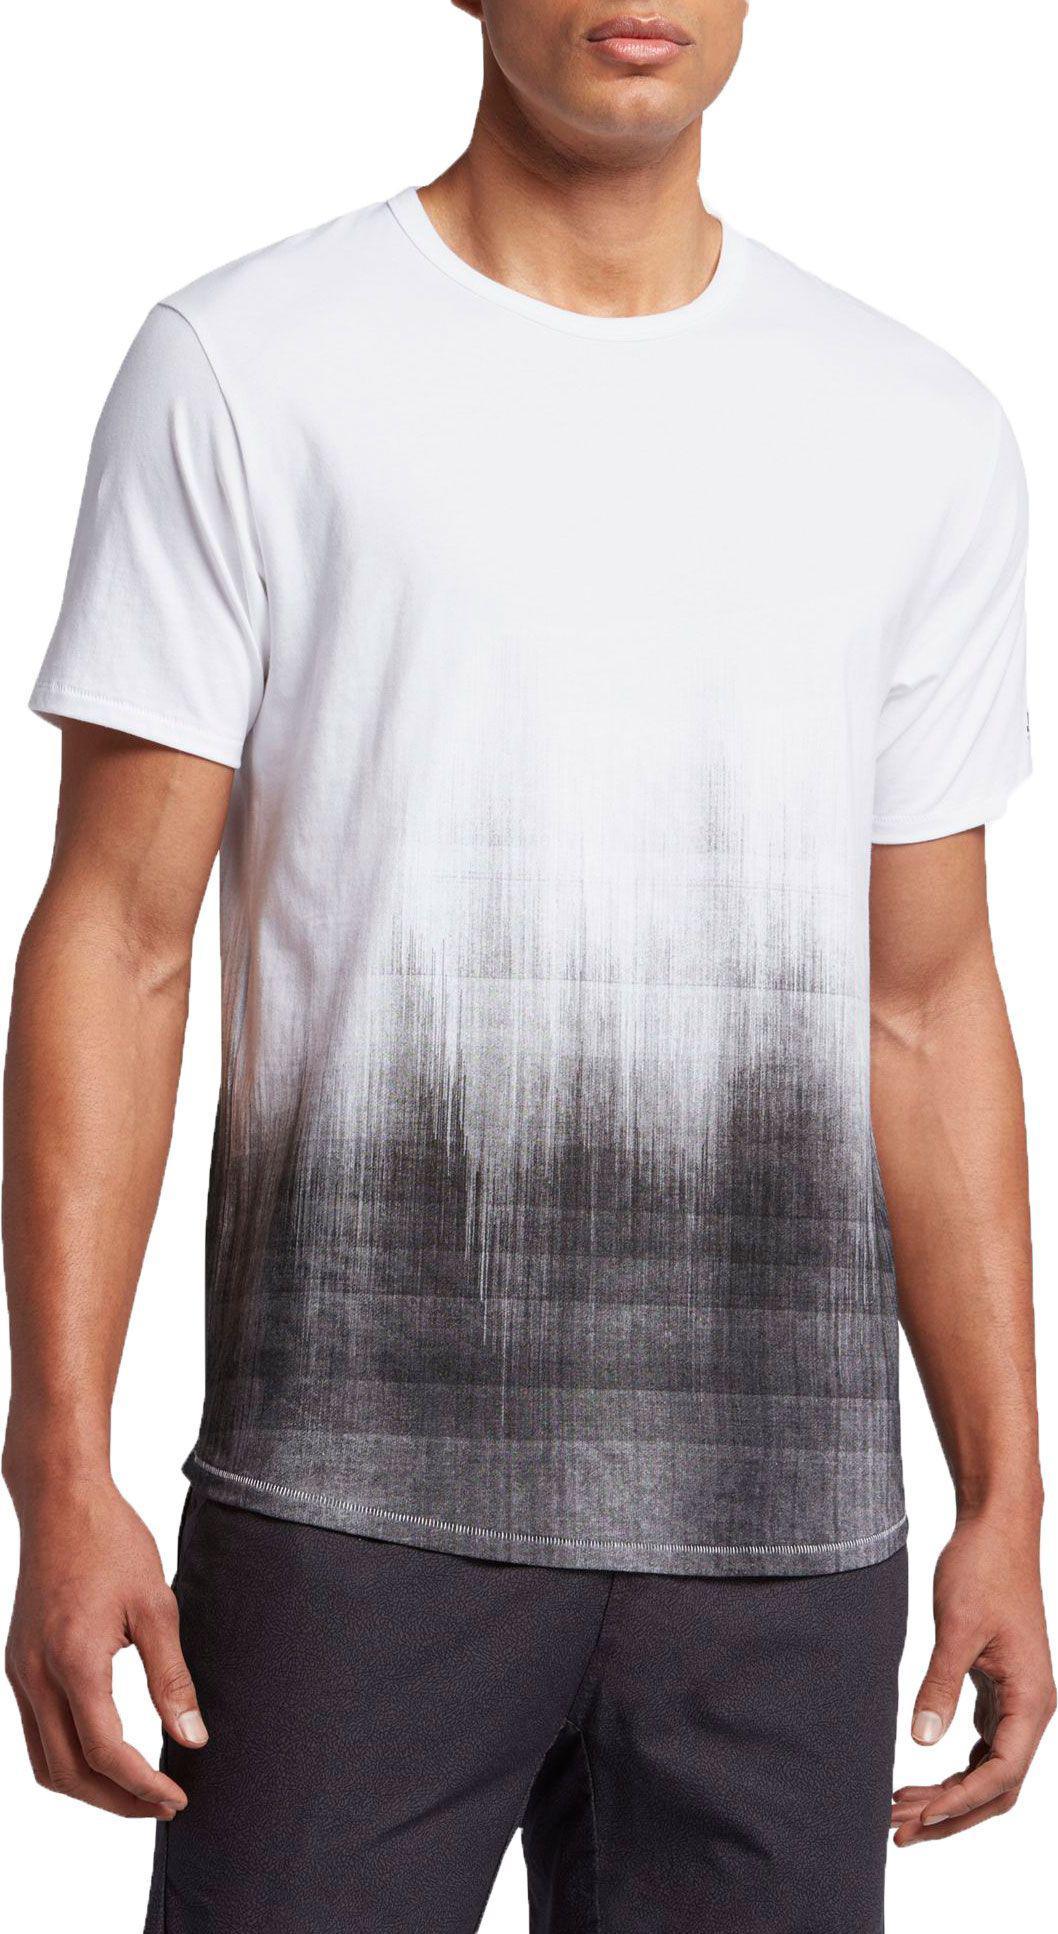 Jordan Dry Scorch Men's T-Shirts White/Black